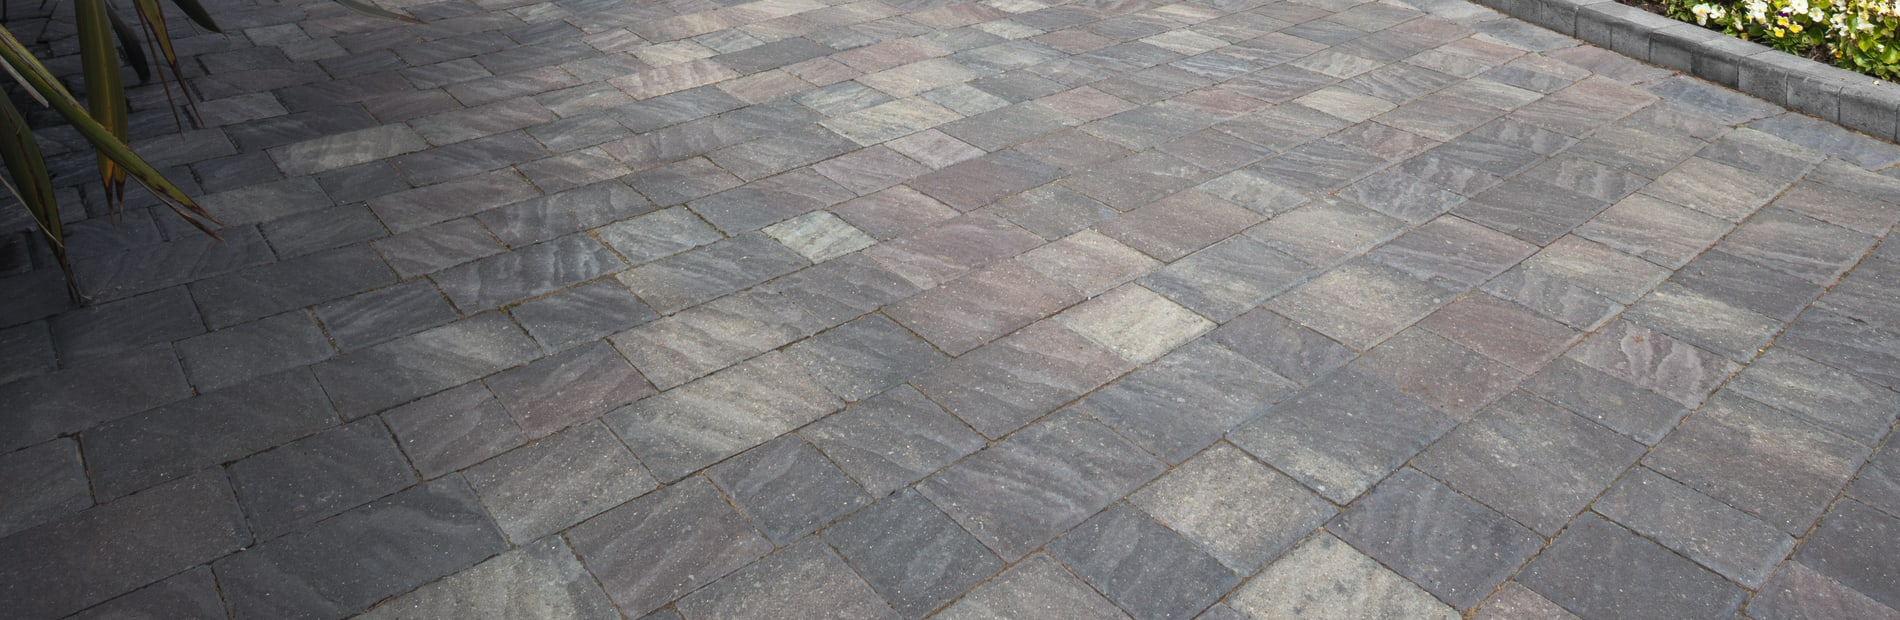 marshalls drivesett natrale driveway paving in slate colour.